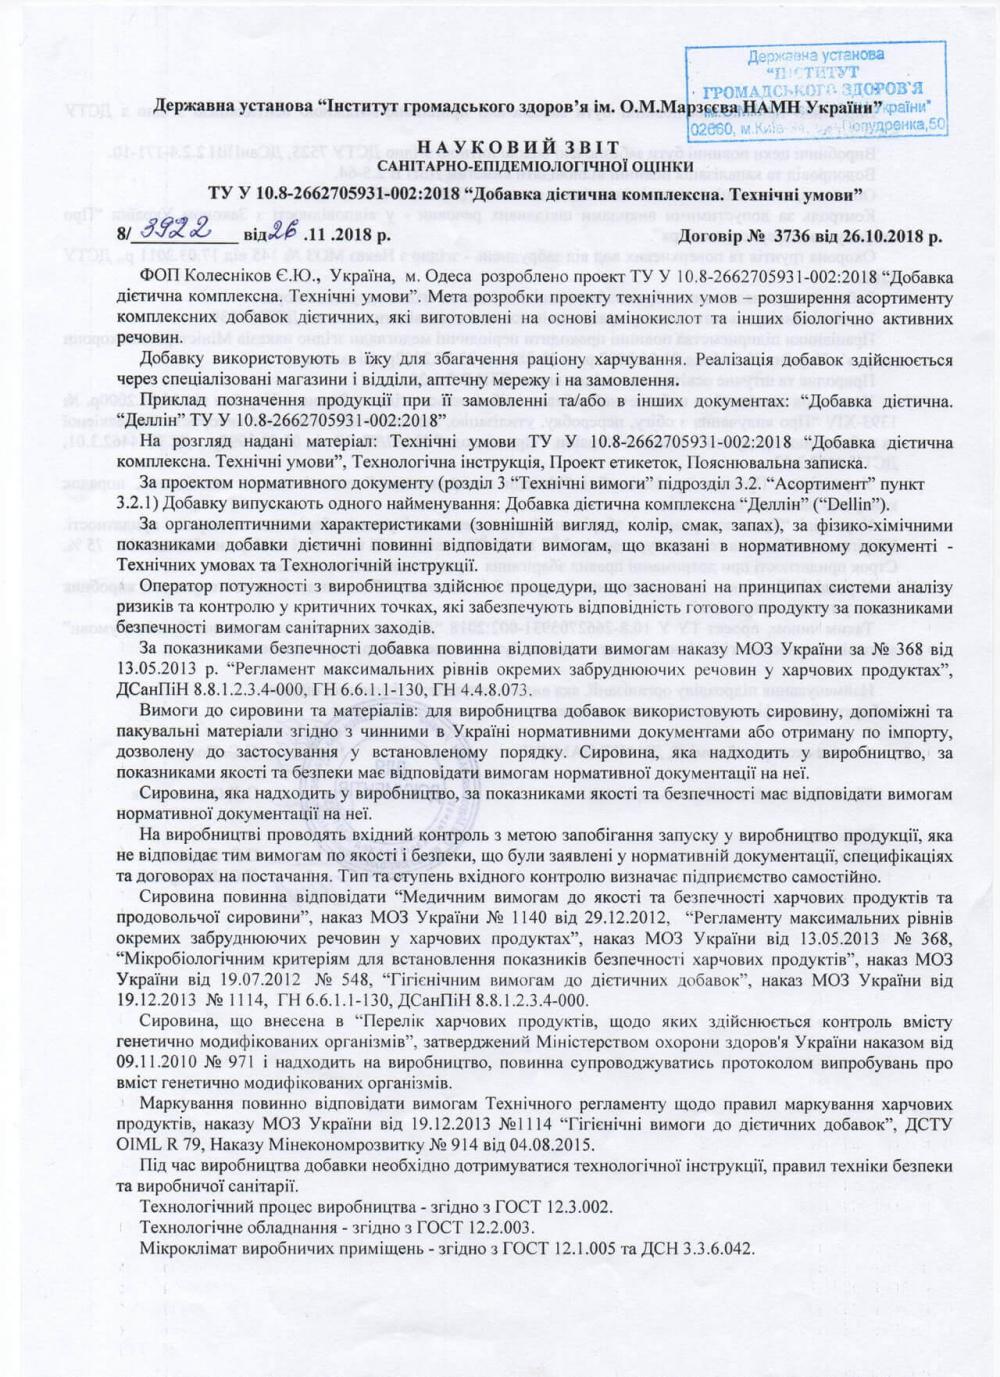 Деллин - препарат от бессонницы - 3